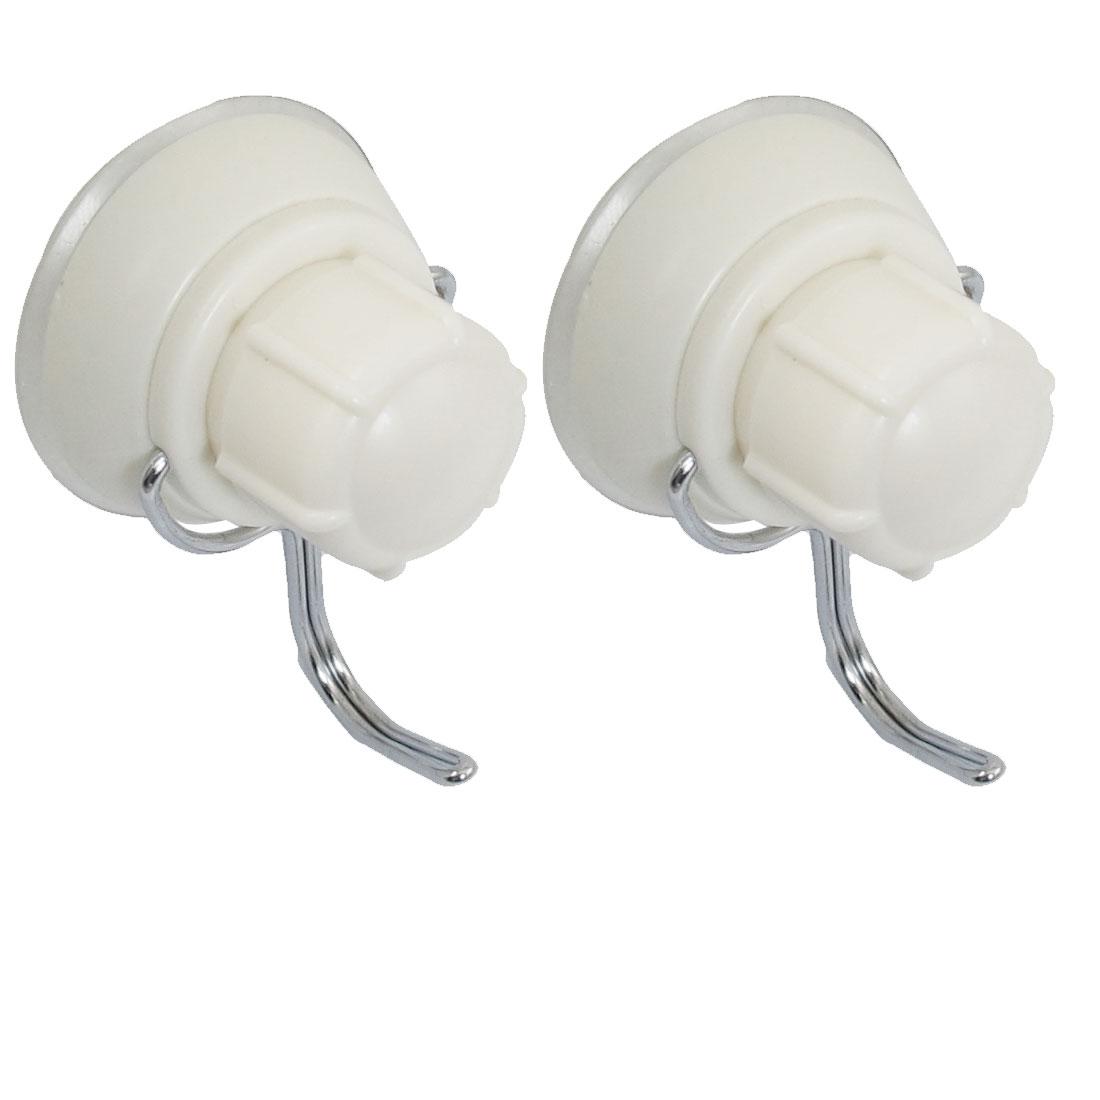 2 Pcs Bathroom 40mm Dia Suction Cup 1.5kg Load Beige Cover Hook Hanger